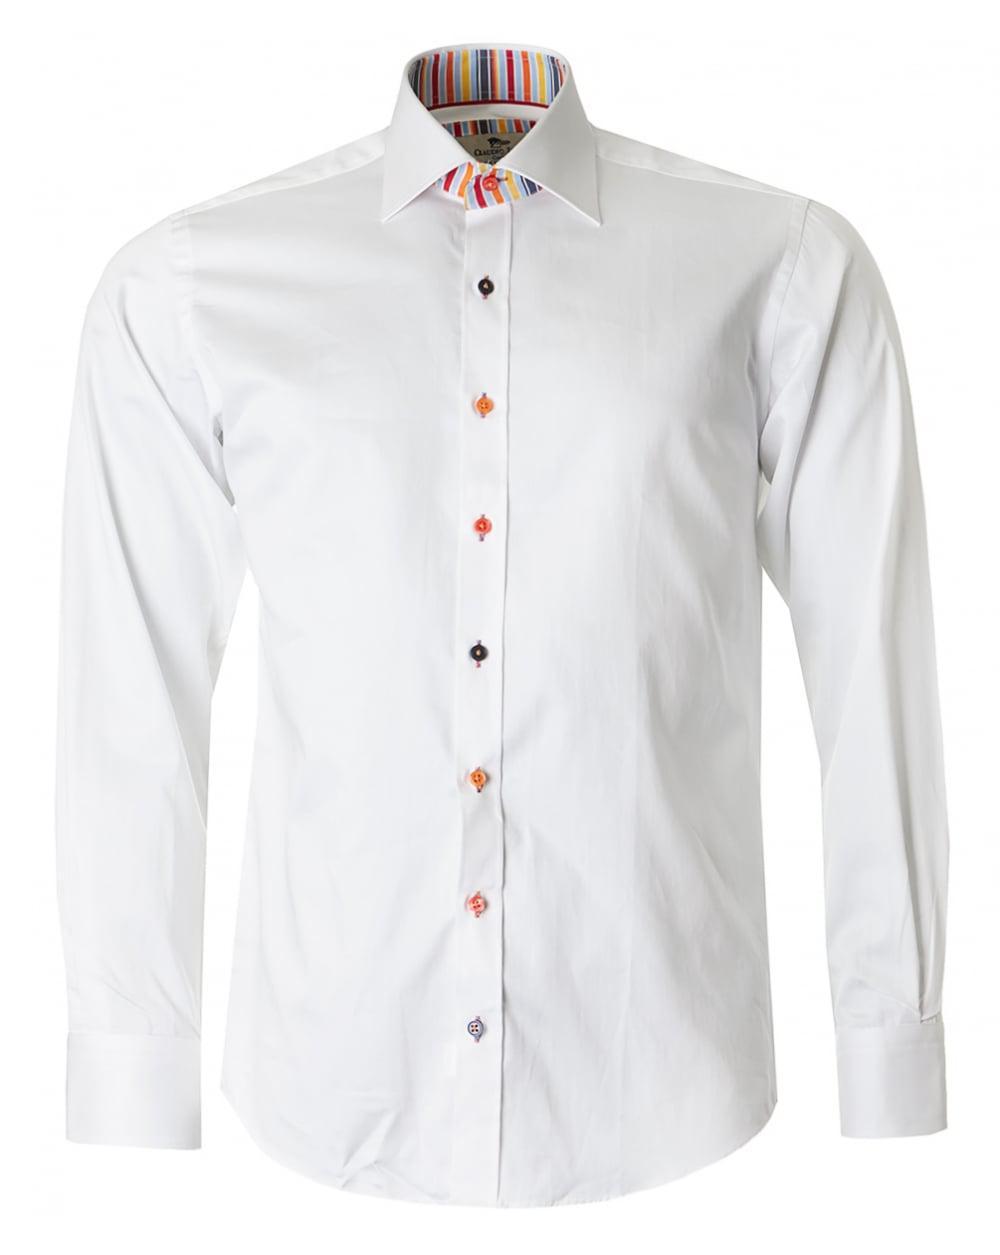 9c99fc7d4efd8 Claudio Lugli Stripe Trim Shirt in White for Men - Lyst